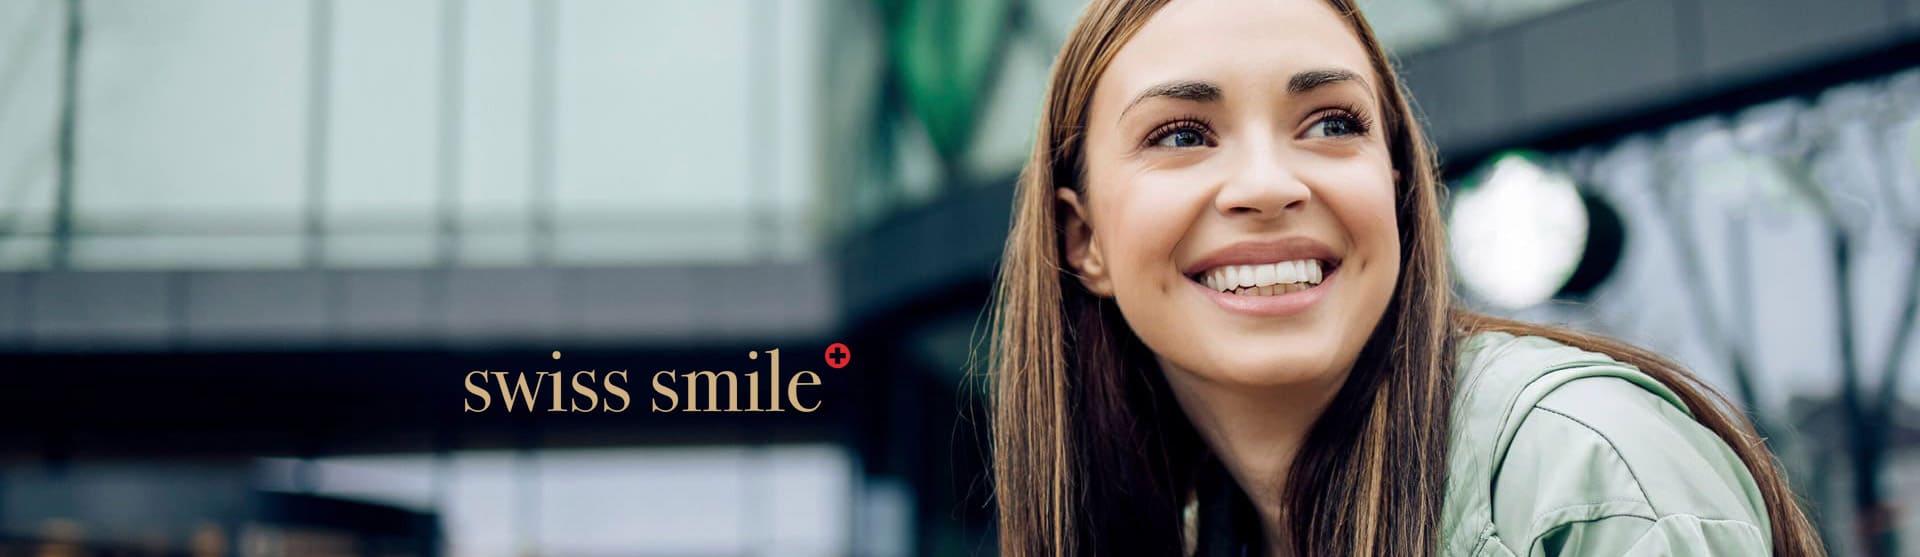 swiss-smile-header